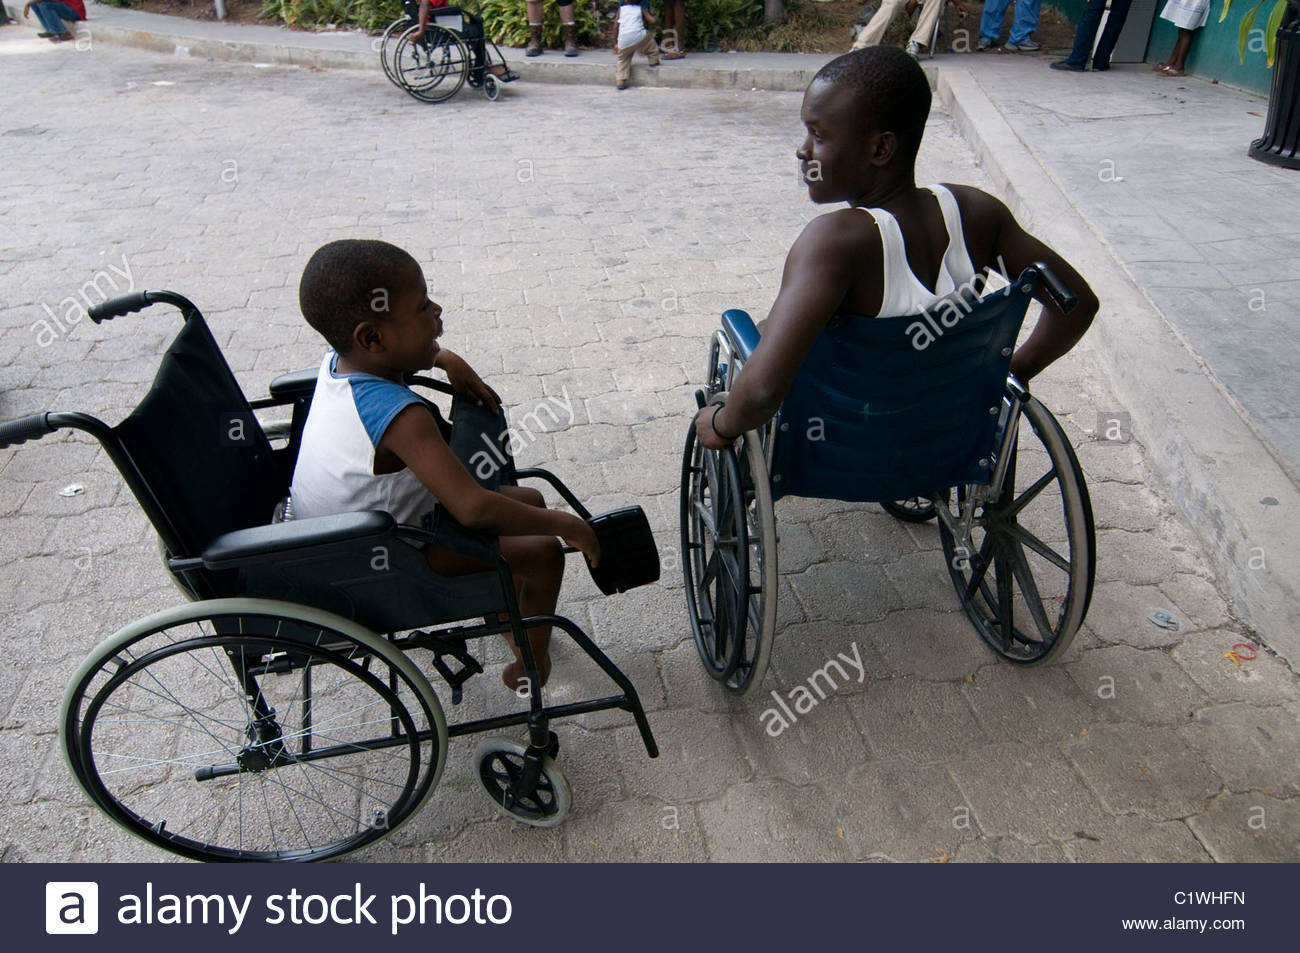 Earthquake survivors in a hospital in Port-au-Prince Haiti - Stock Image